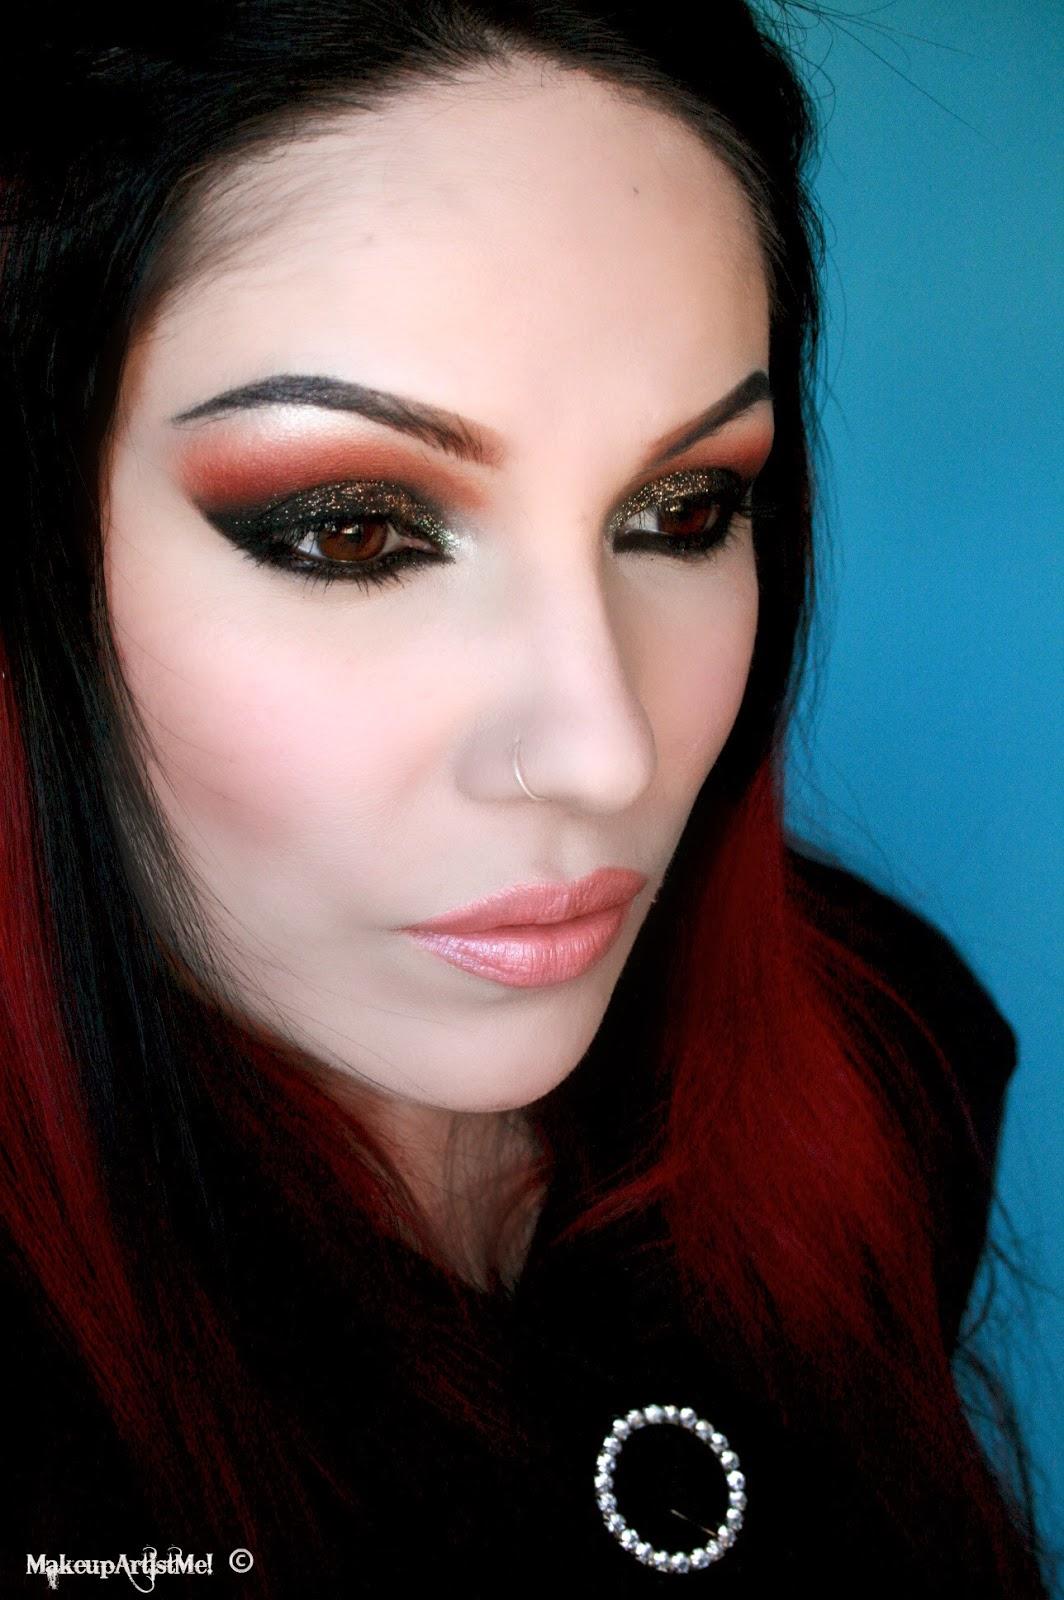 Make Up Artist Me Light The Night Makeup Tutorial